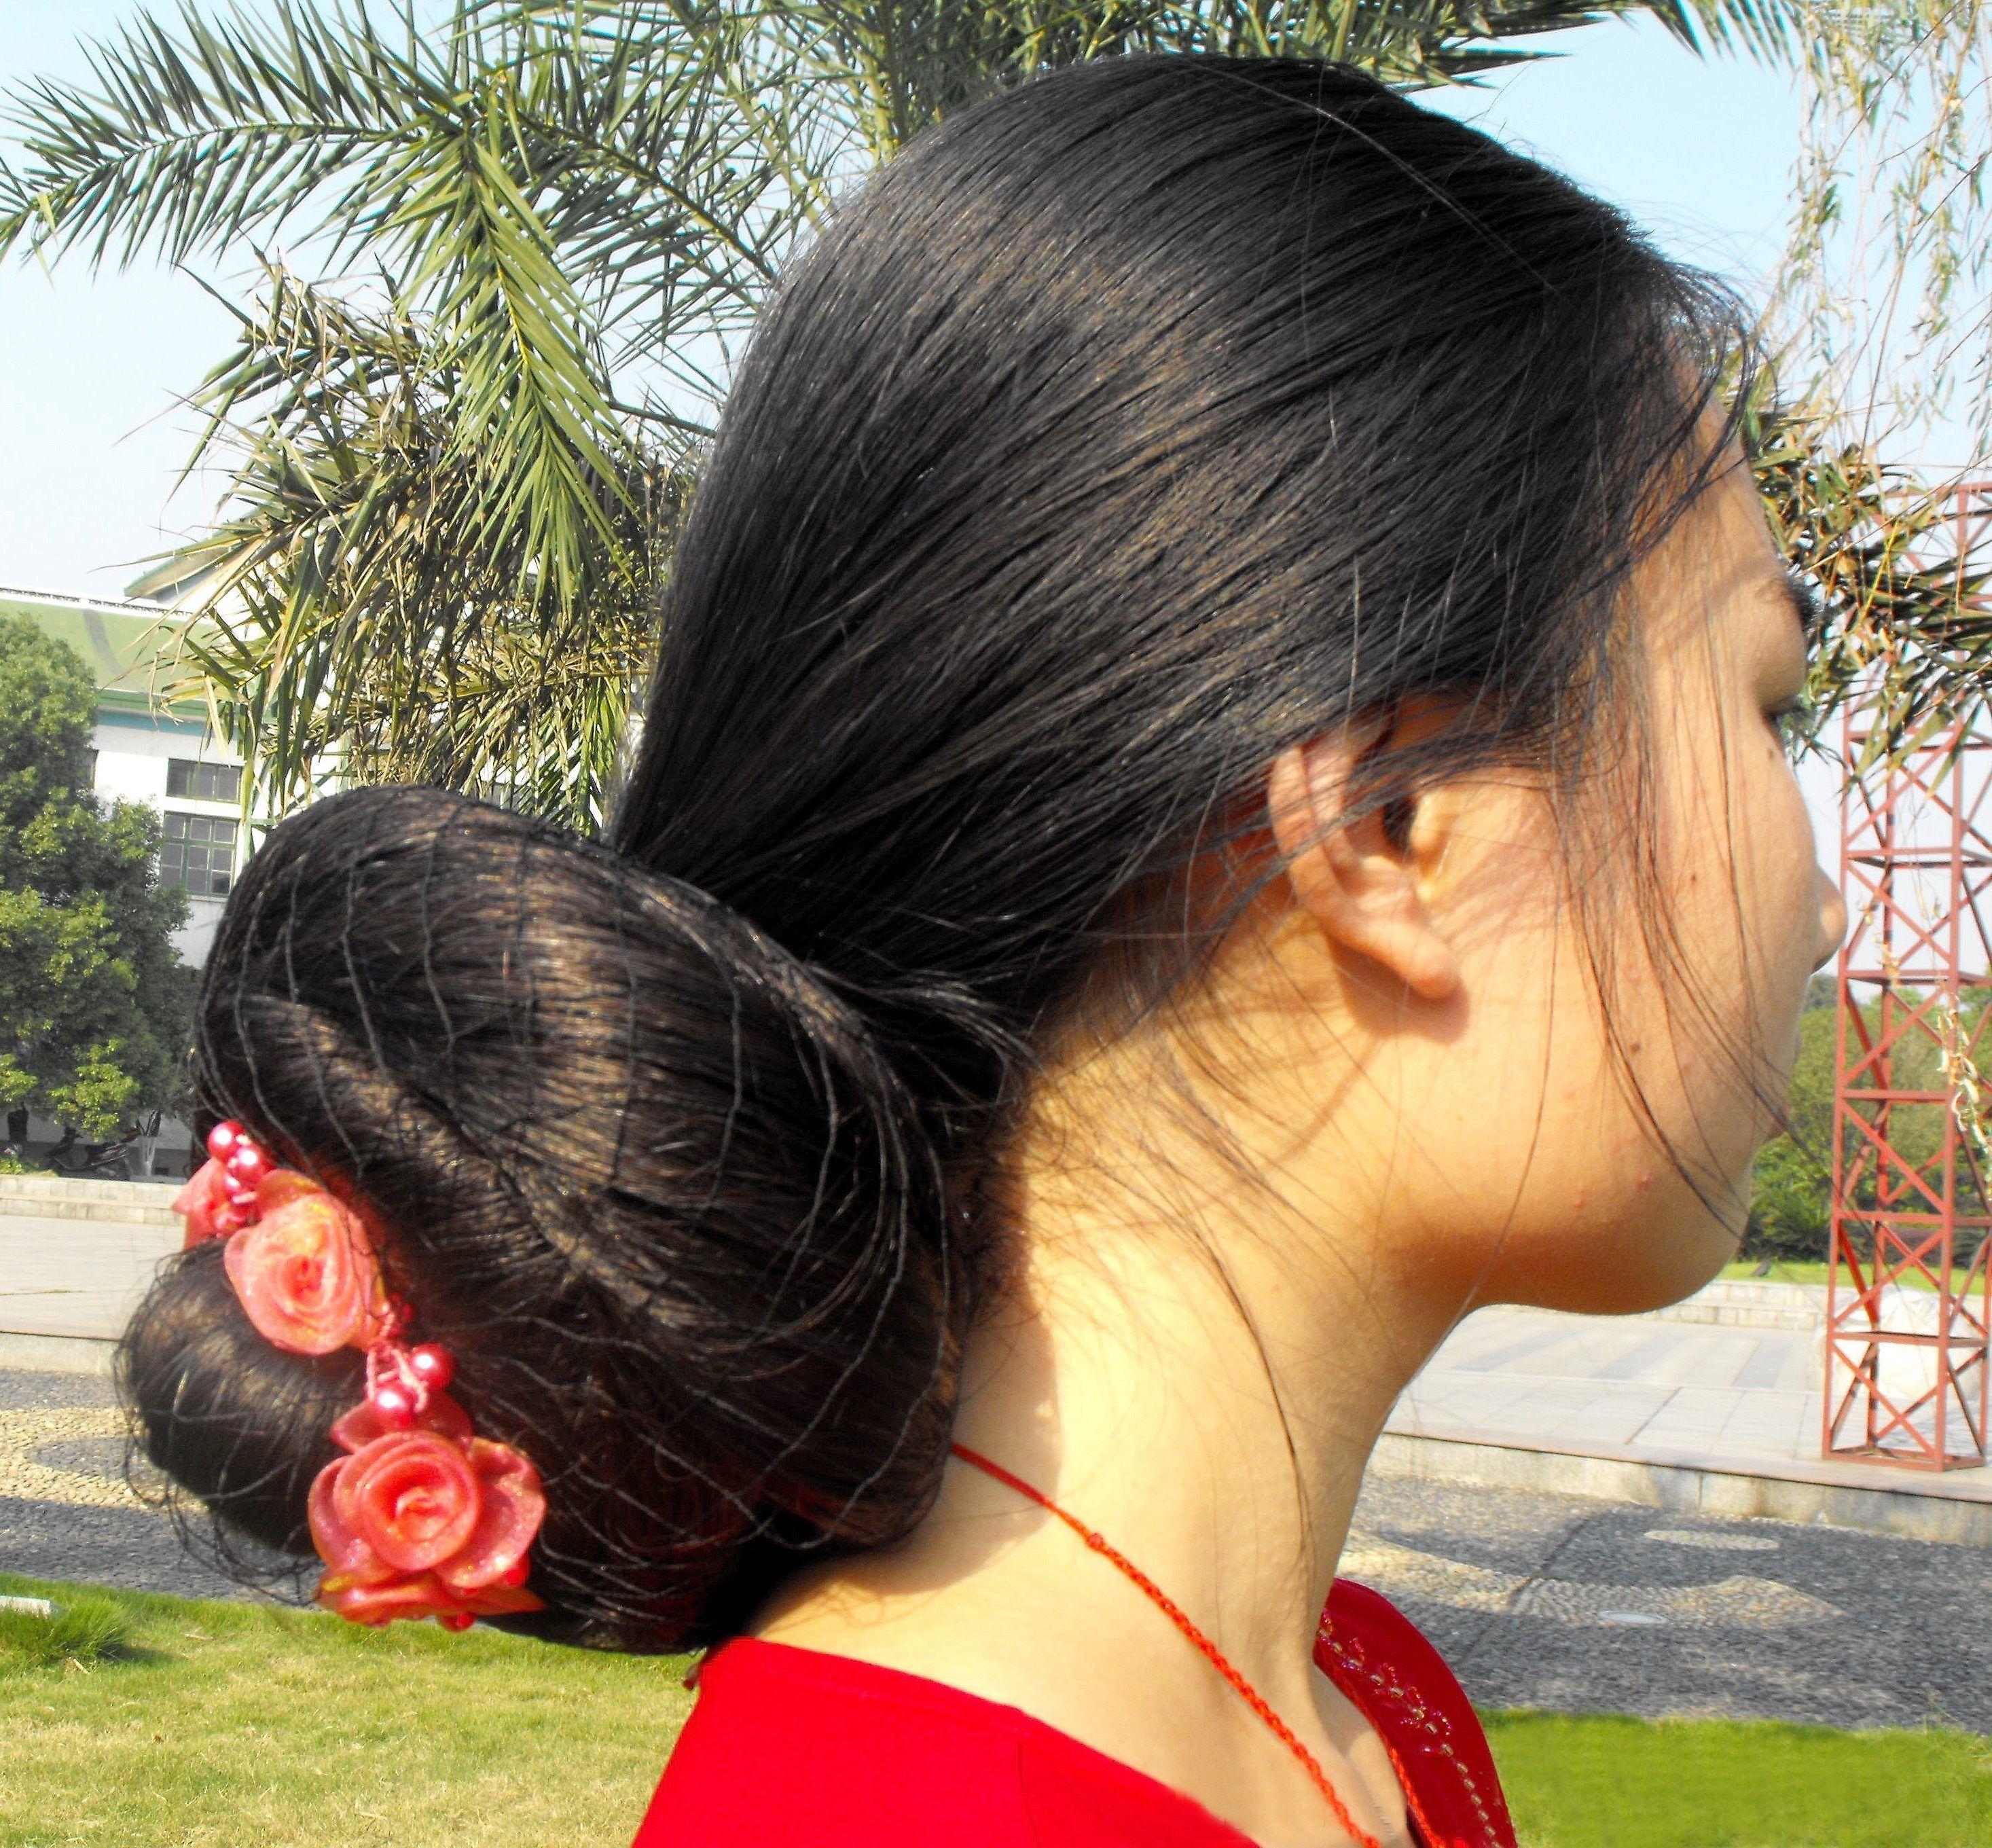 Rambut Sangat Panjang, Sanggul